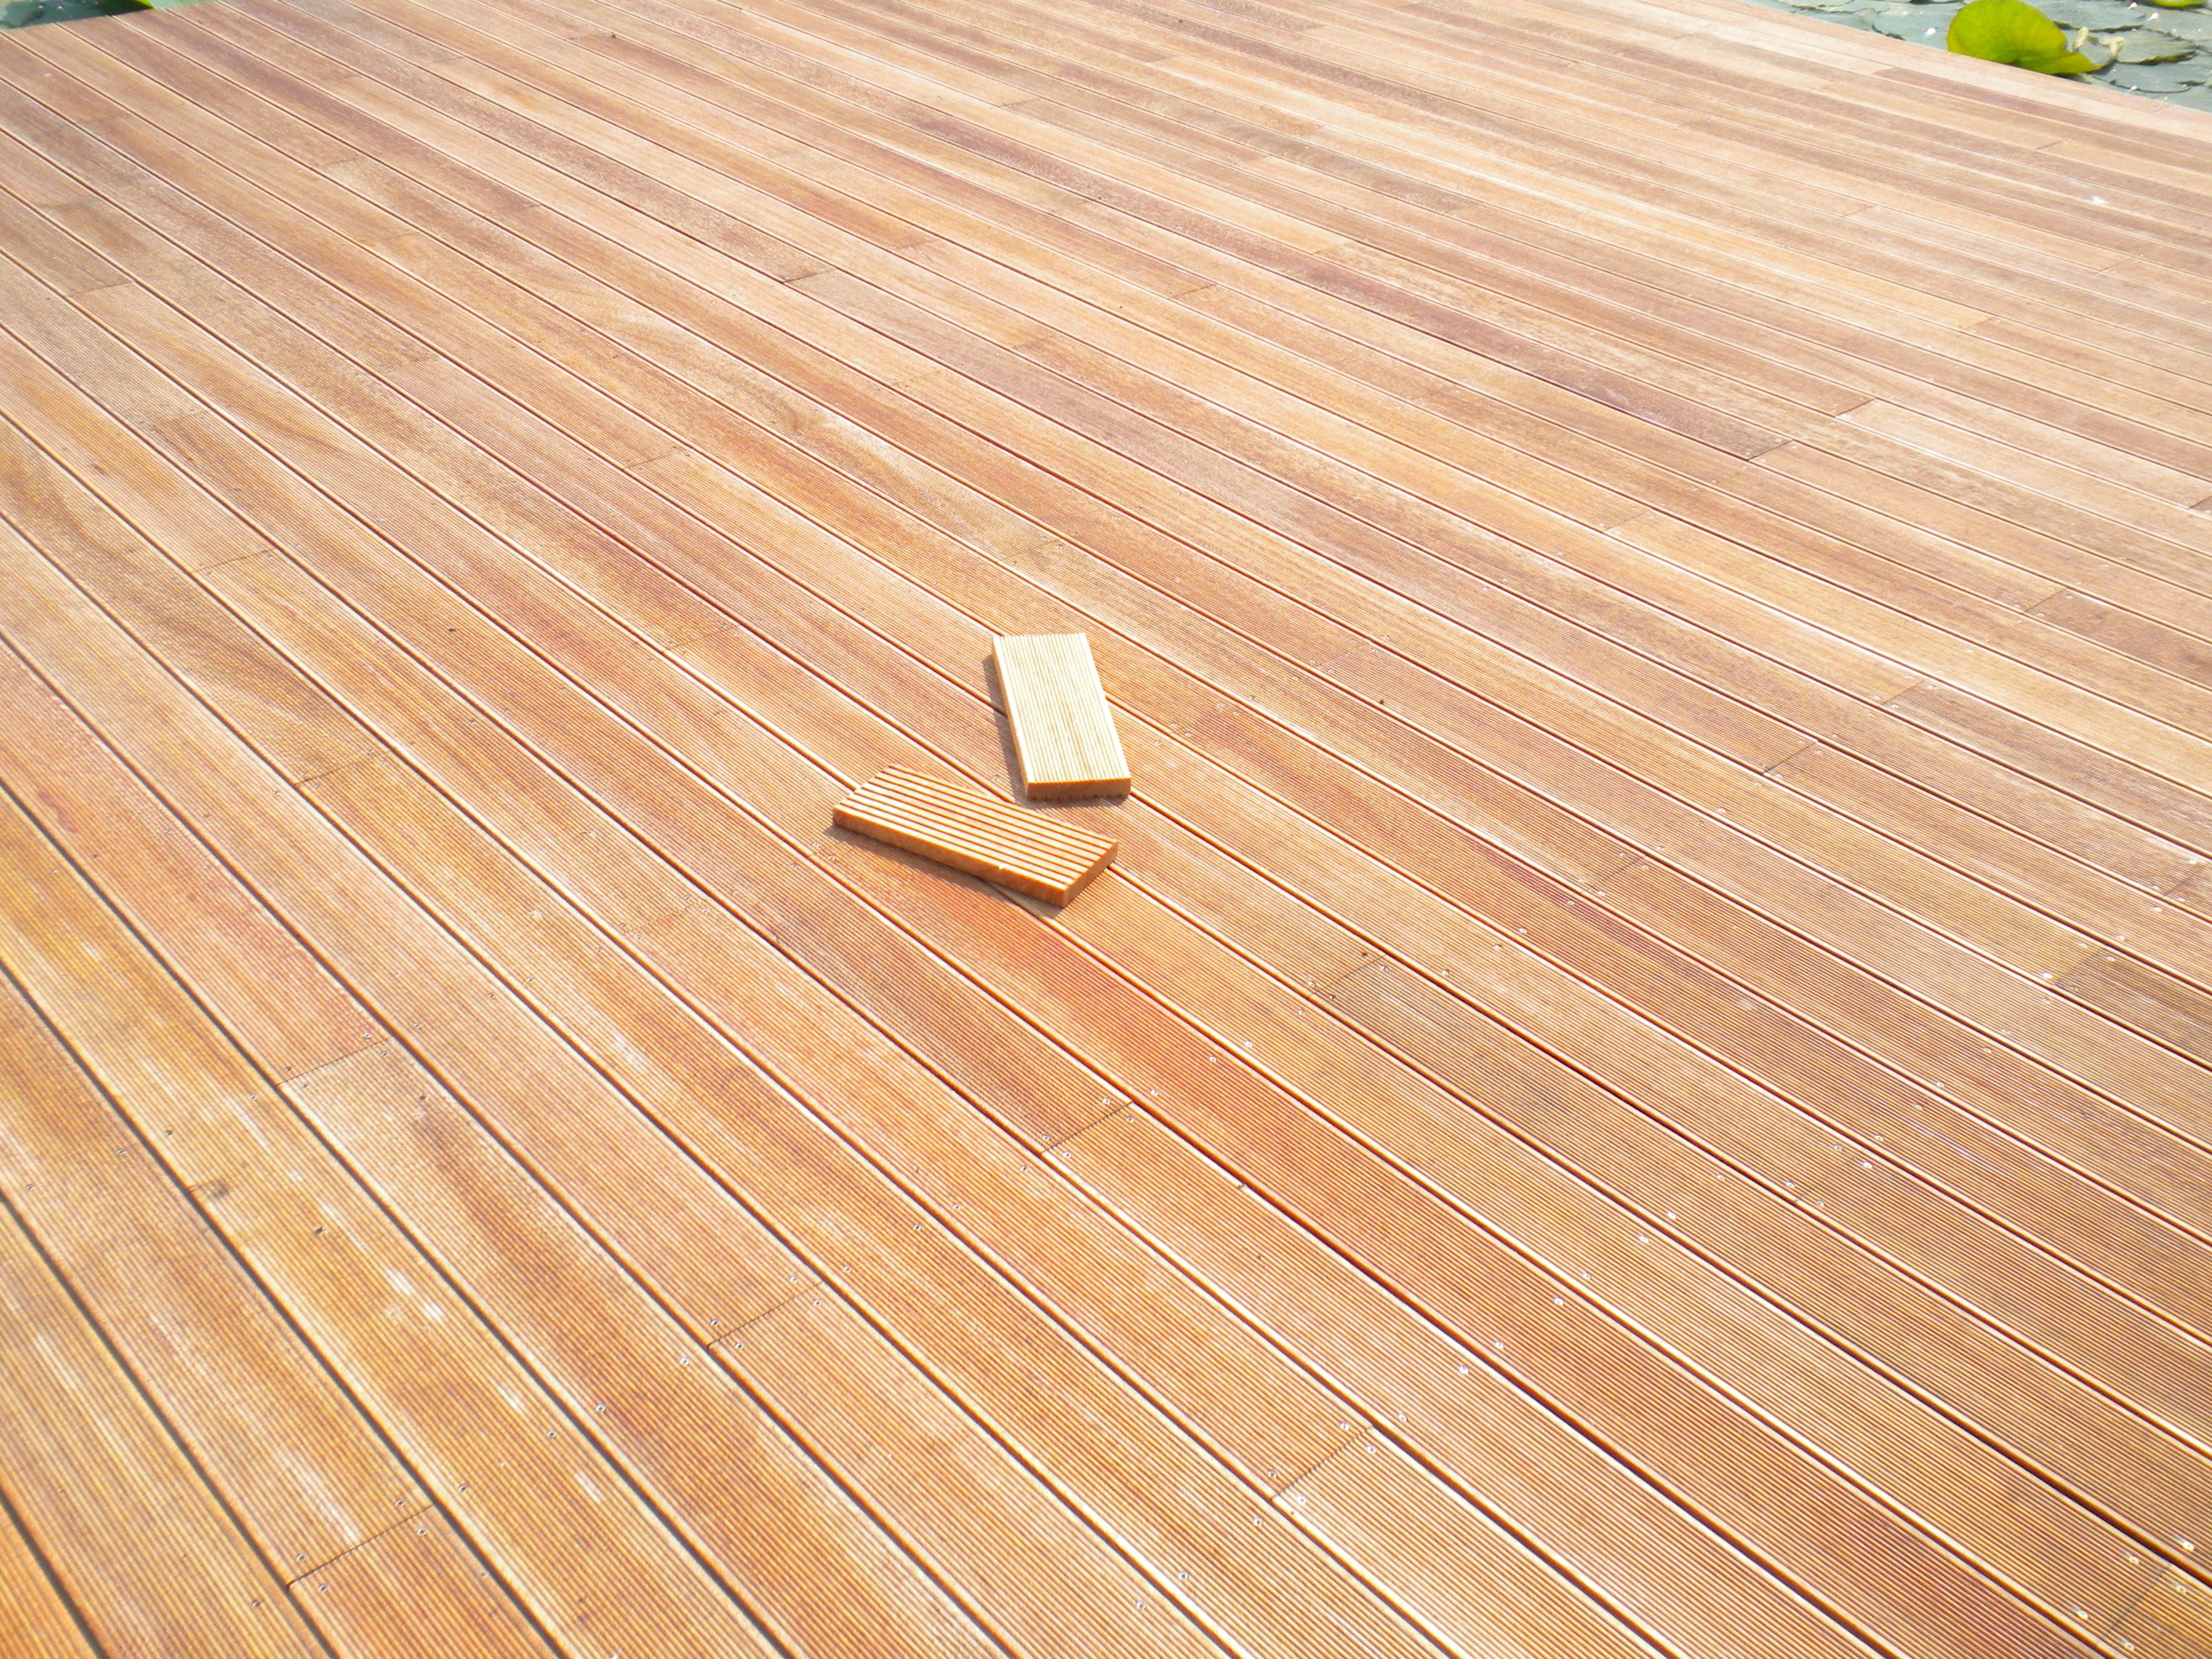 Deck-uri lemn - Angelim Pedra SELVA FLOORS - Poza 2